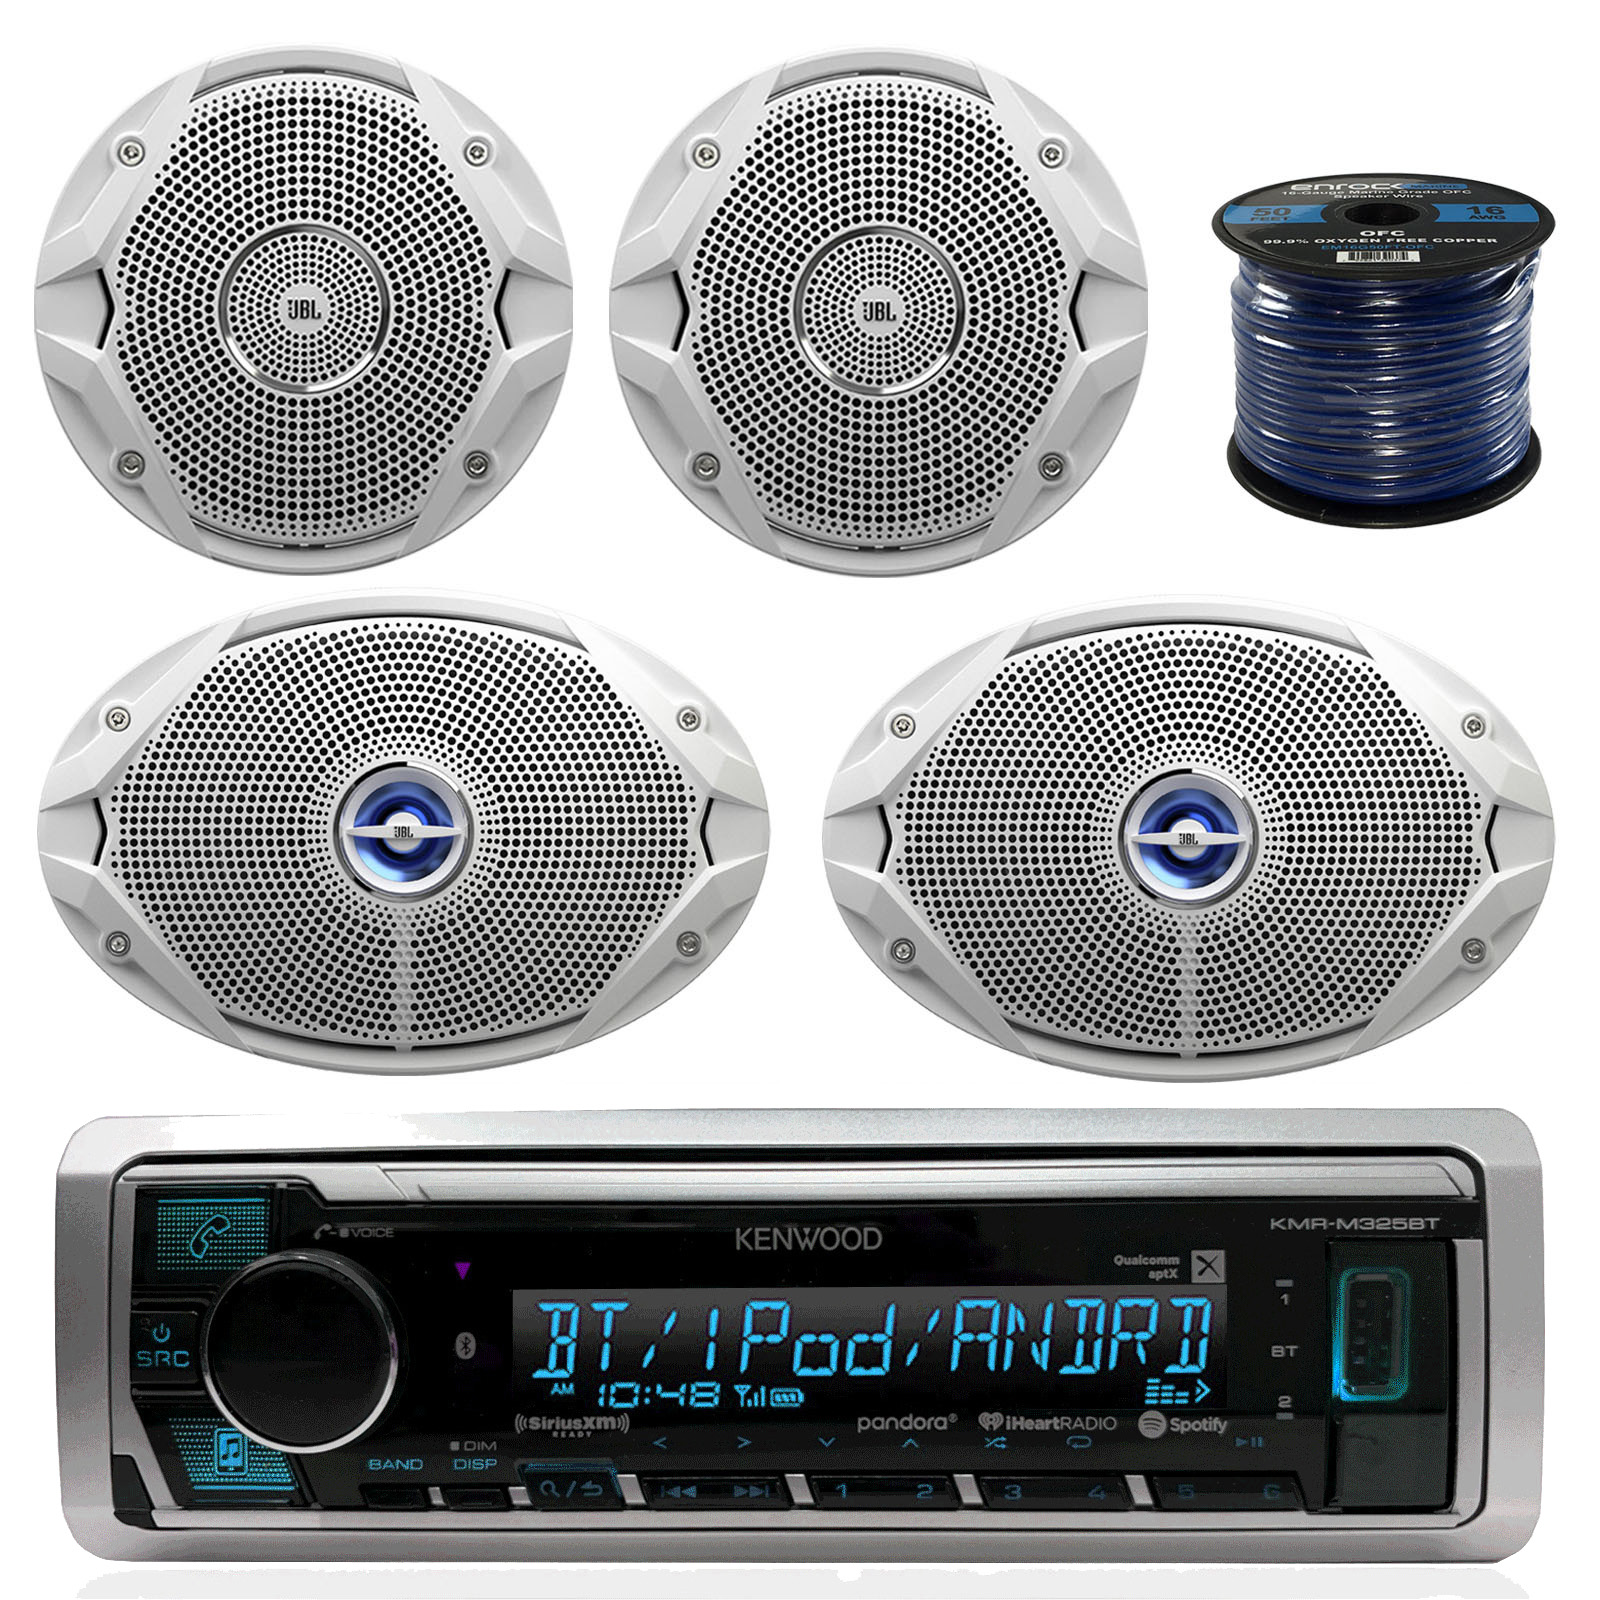 "Kenwood Marine Digital Media Bluetooth Receiver, 2x JBL 6.5"" White Speakers, 2x JBL 6x 9"" 2-Way Marine Speakers (White), Marine 50 FT 16-G Tinned Speaker Wire"